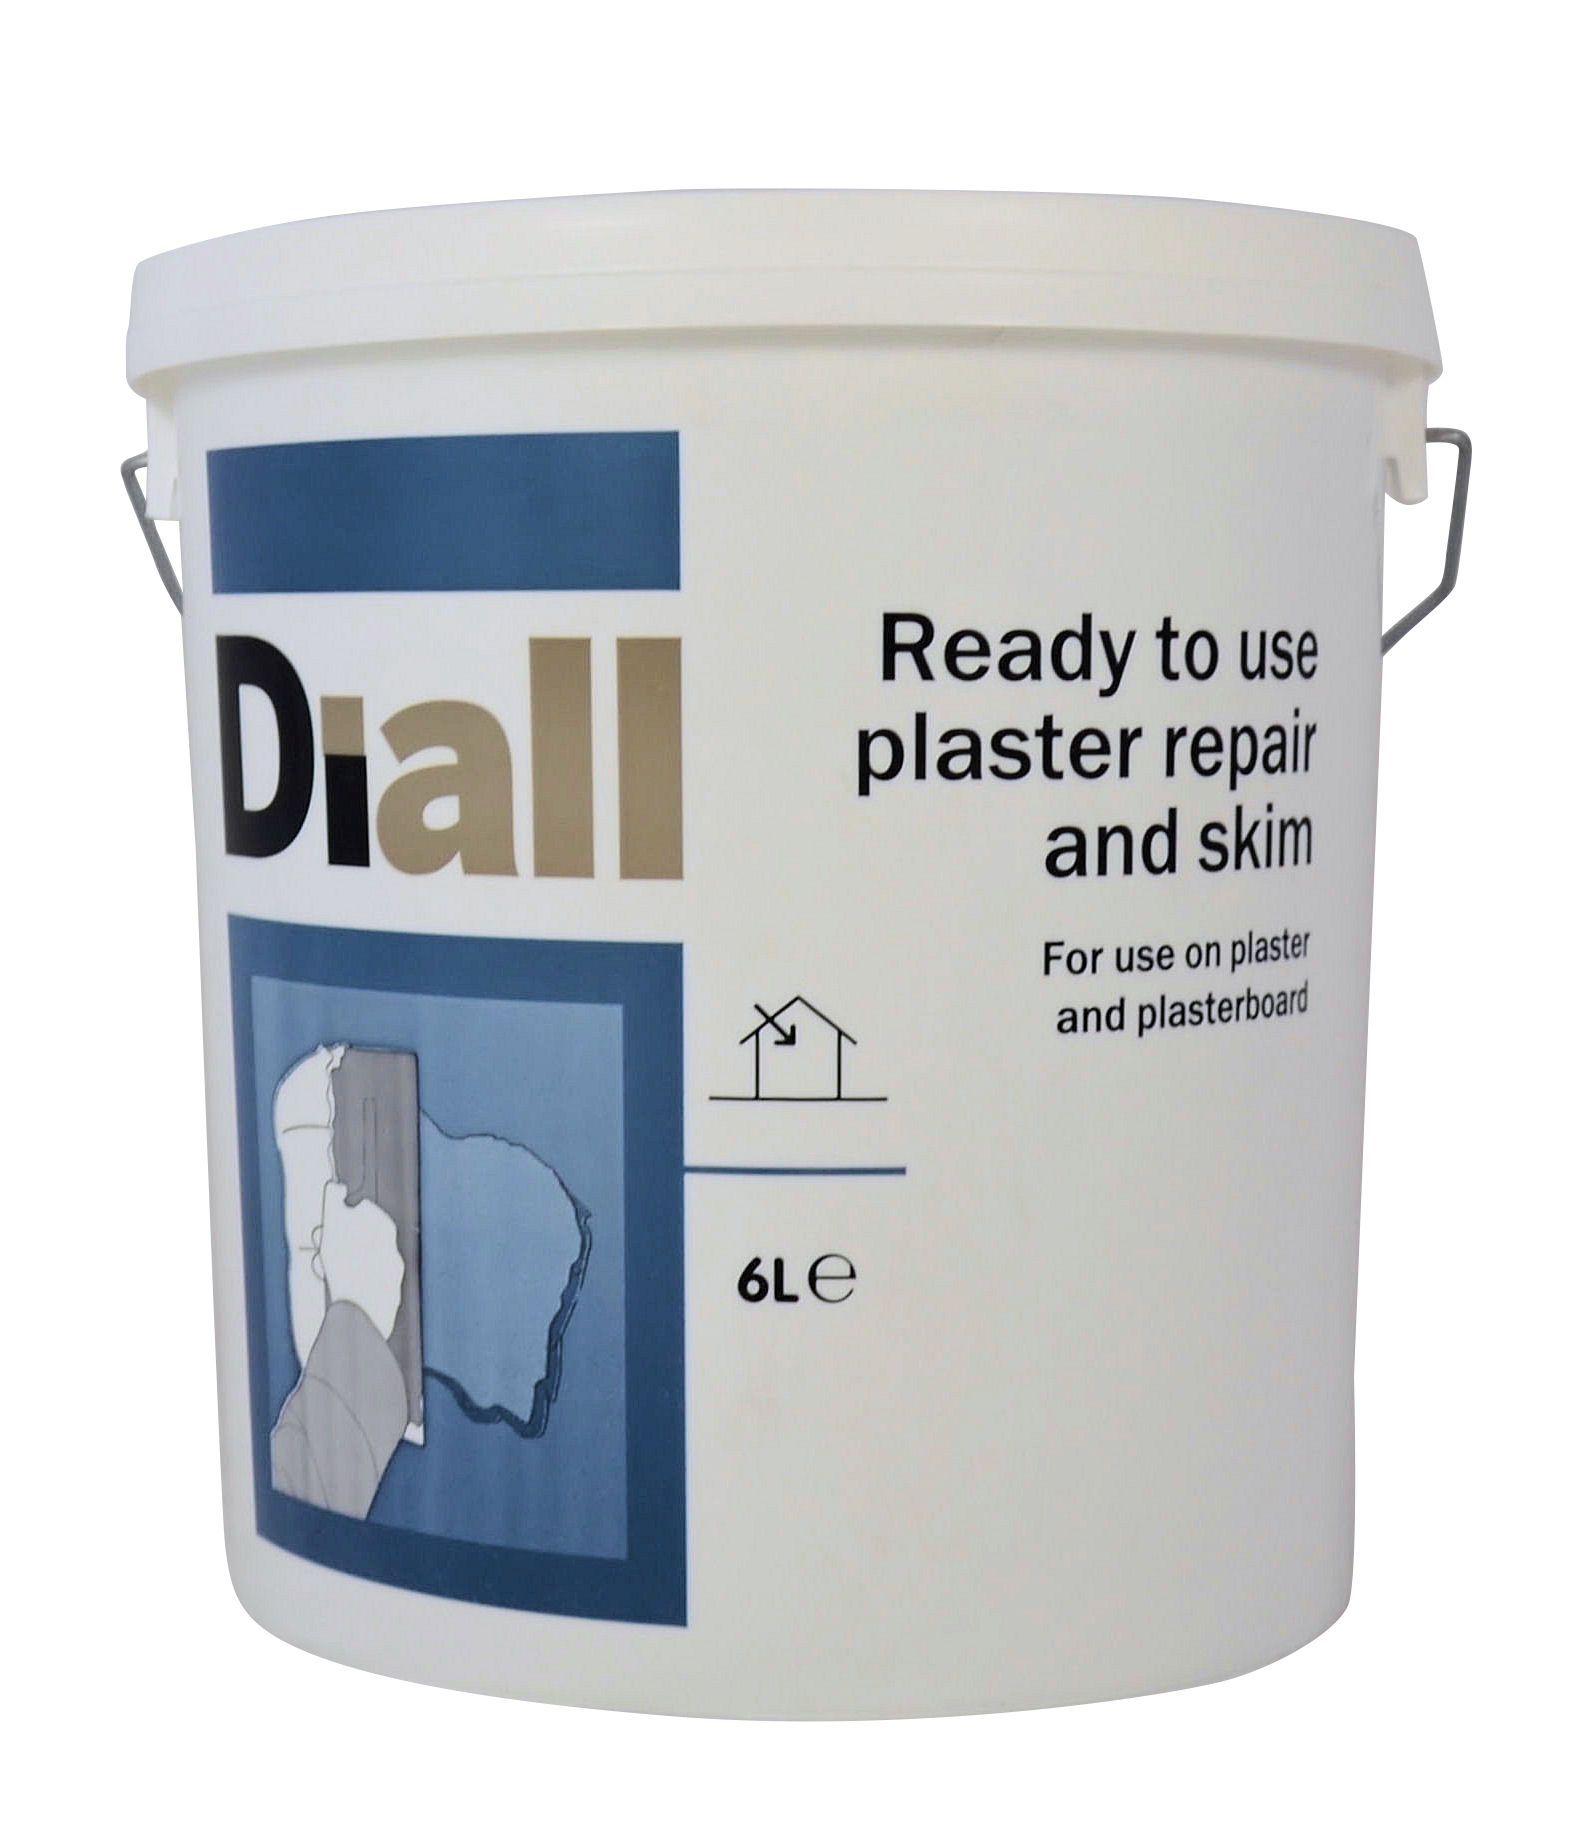 B And Q Plaster Wall Lights : B&Q Internal Plaster Repair 6L Departments DIY at B&Q